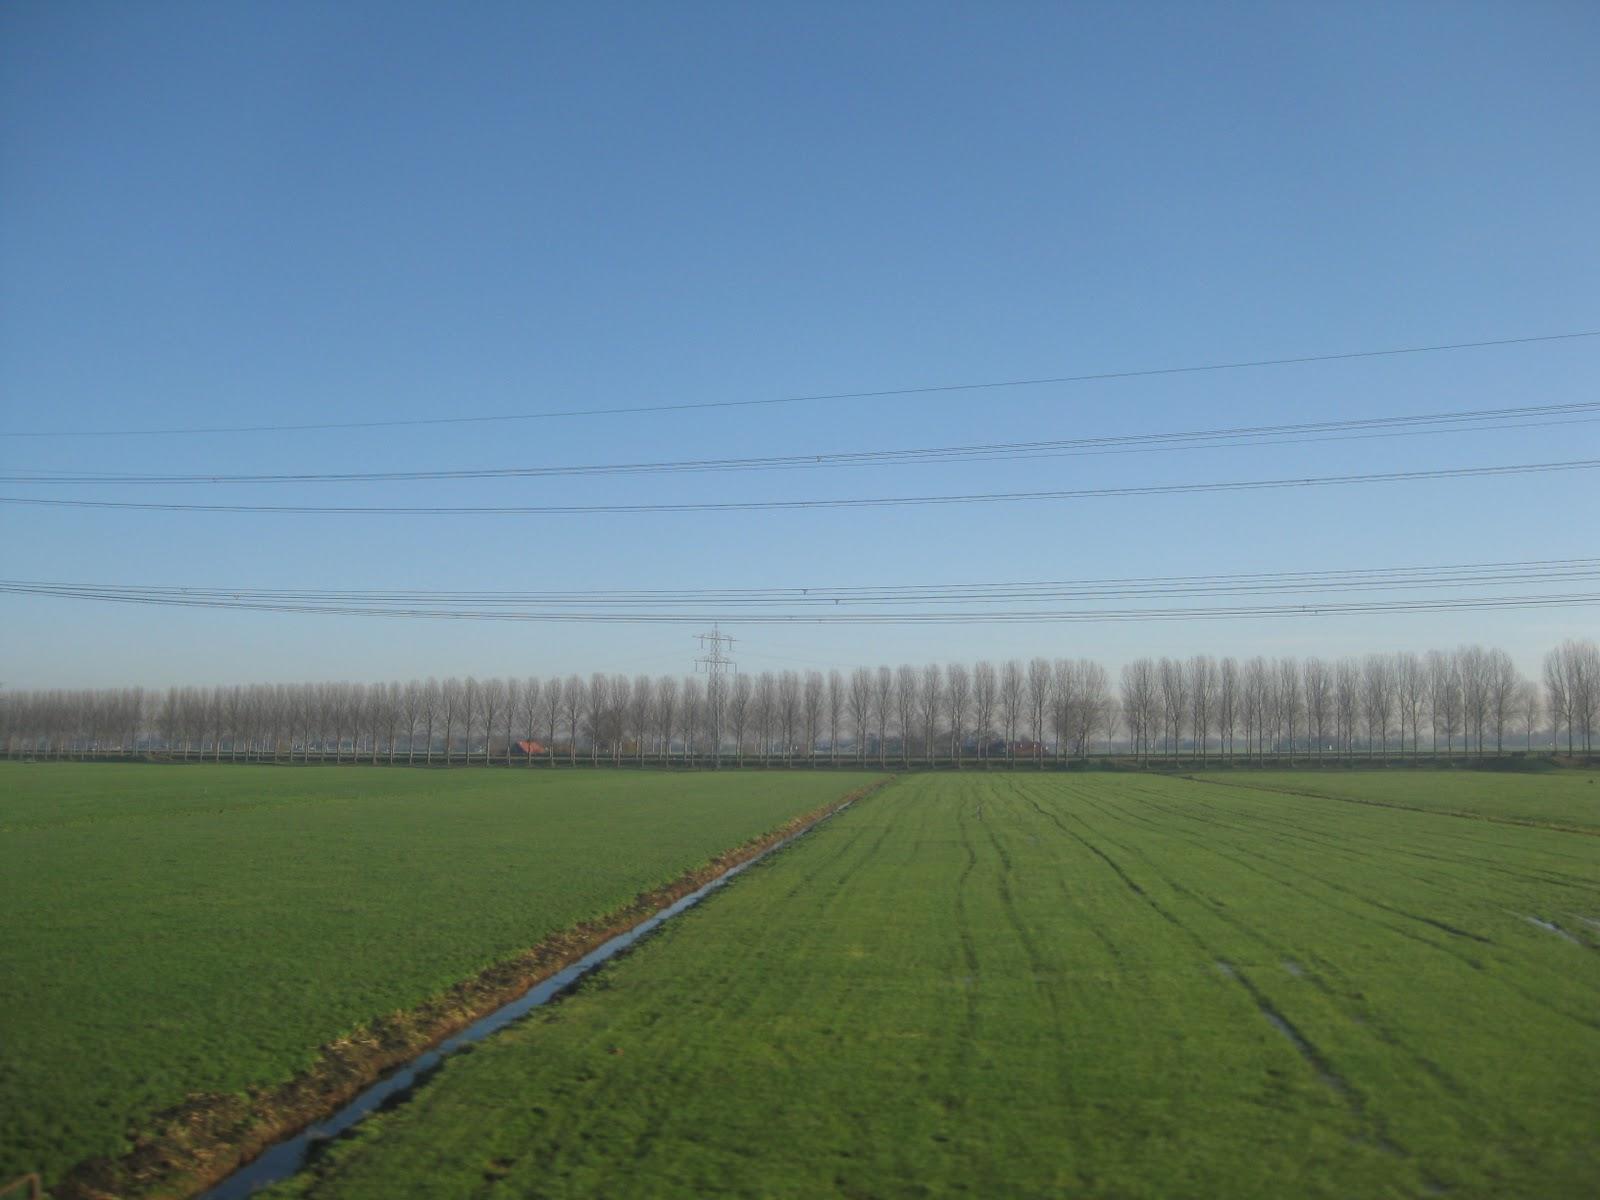 The Netherland landscape